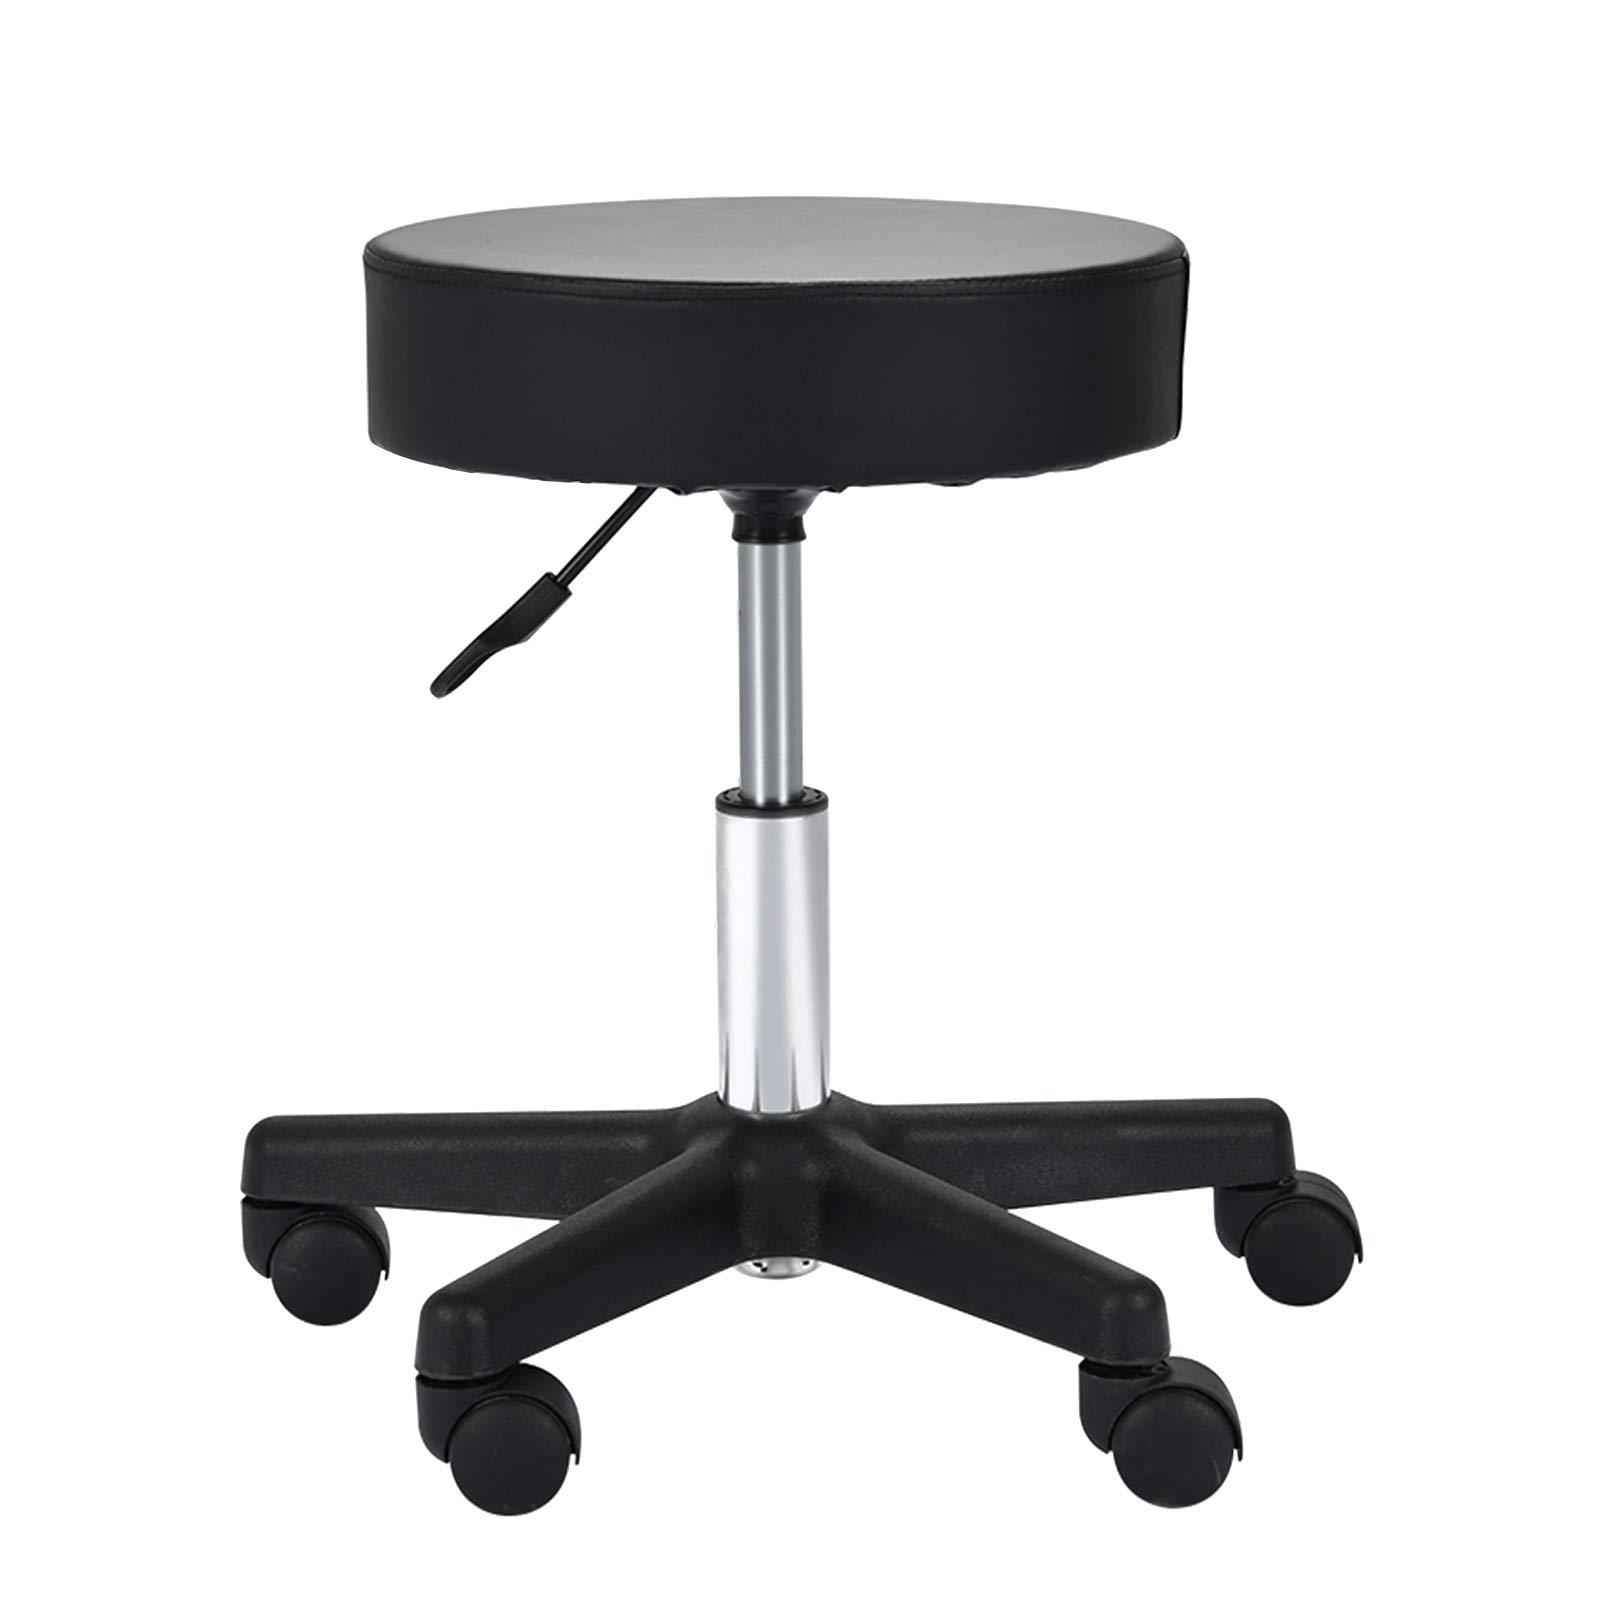 Uenjoy Adjustable Stool for Massage with Ultra-thick Sponge, PU Leather, Hydraulic Rolling Swivel, Massage Spa Tattoo Salon Chair, Black by Uenjoy